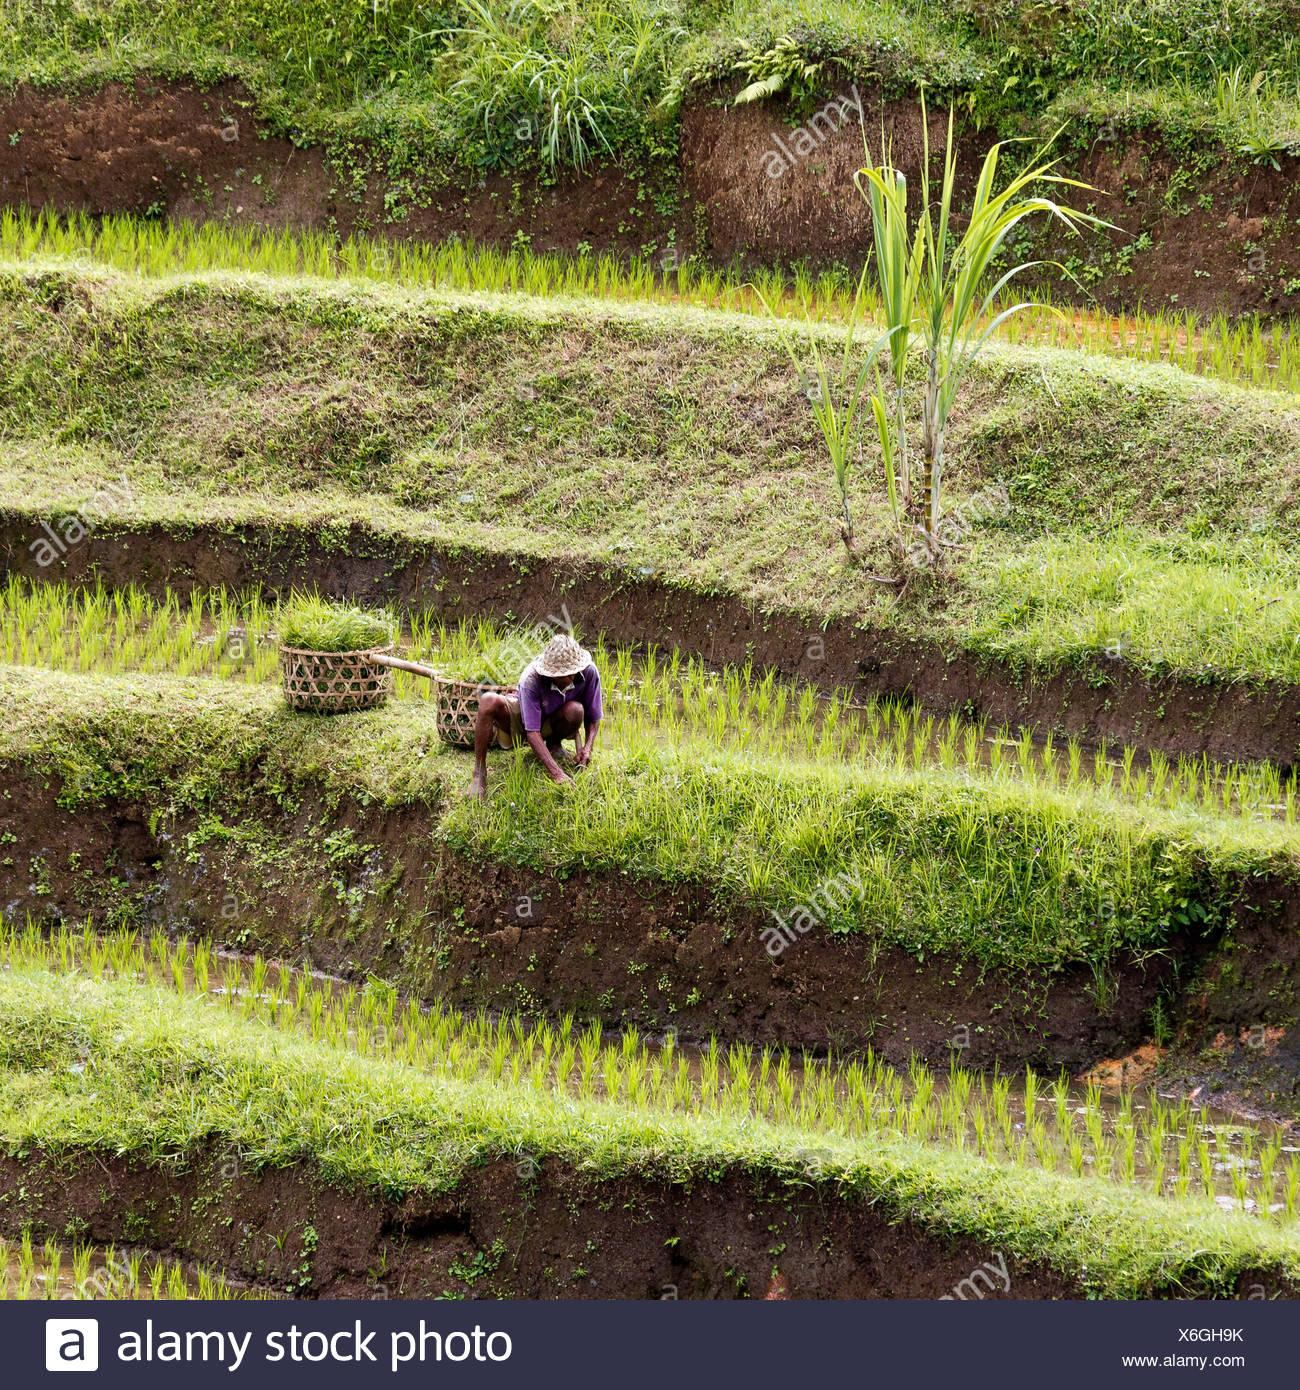 Rice terraces near Ubud, central Bali, Bali, Indonesia, Southeast Asia - Stock Image